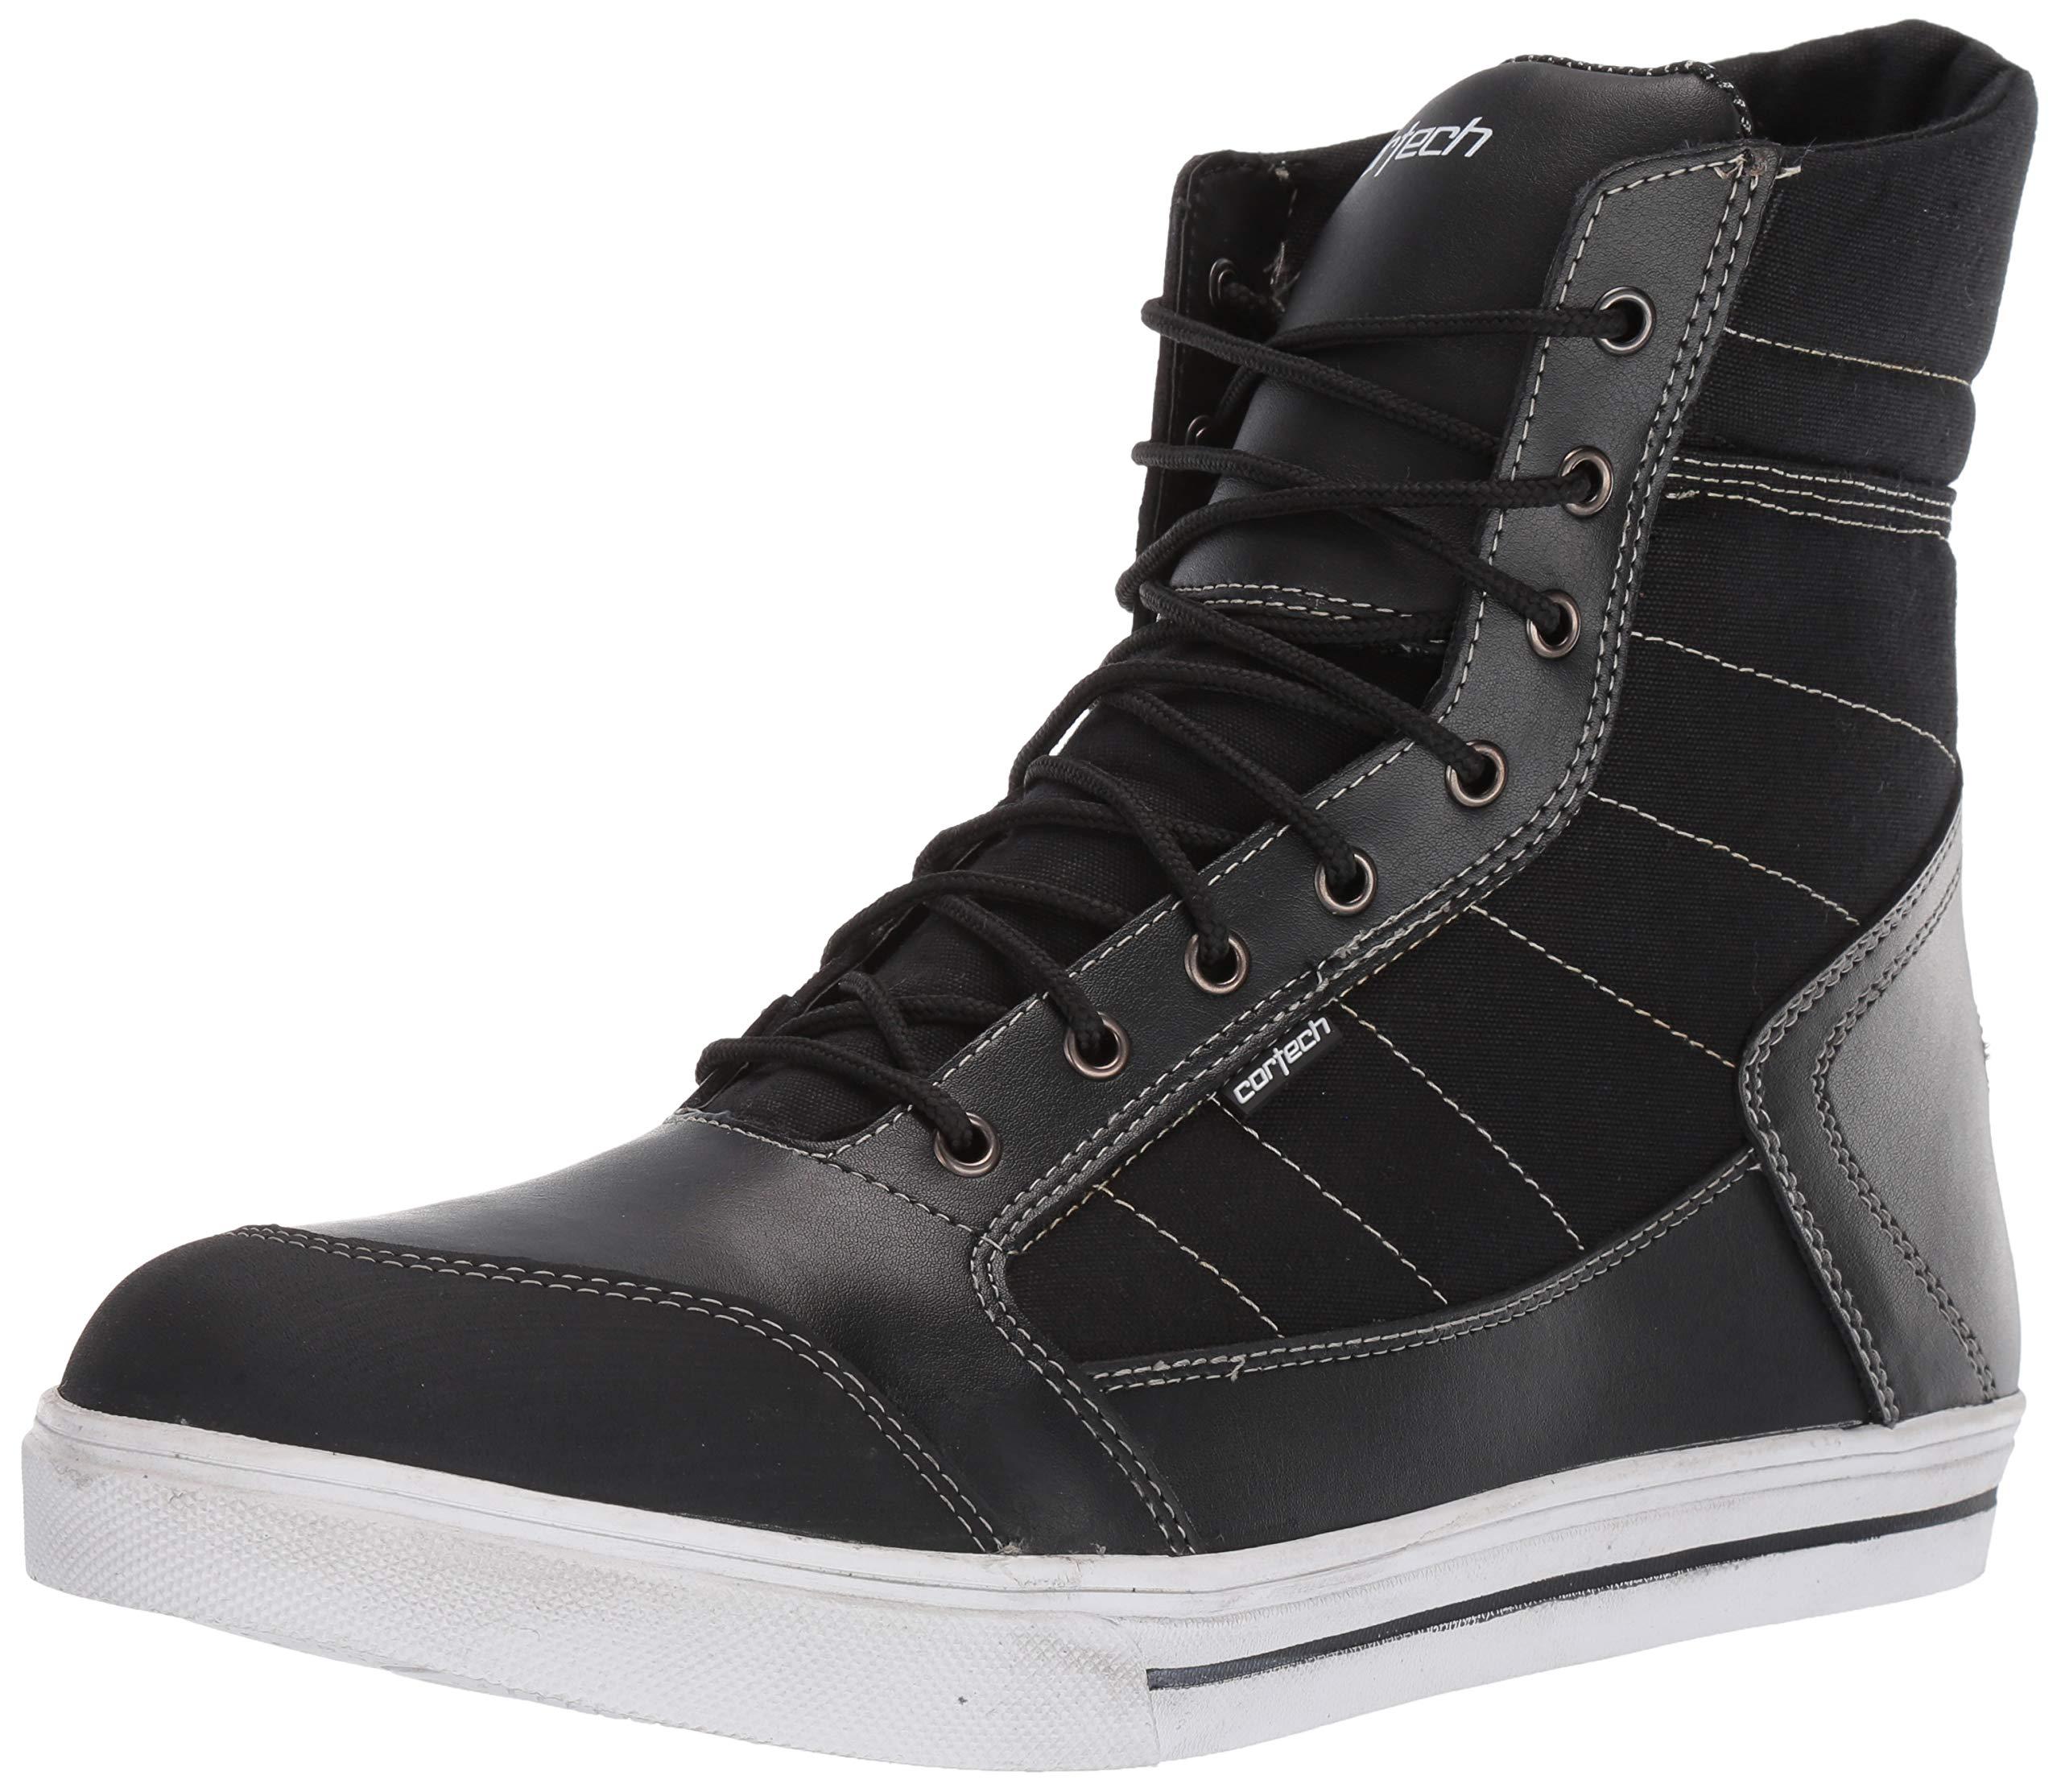 Cortech Men's Vice WP Riding Shoe (White/Black, Size 13) by Cortech